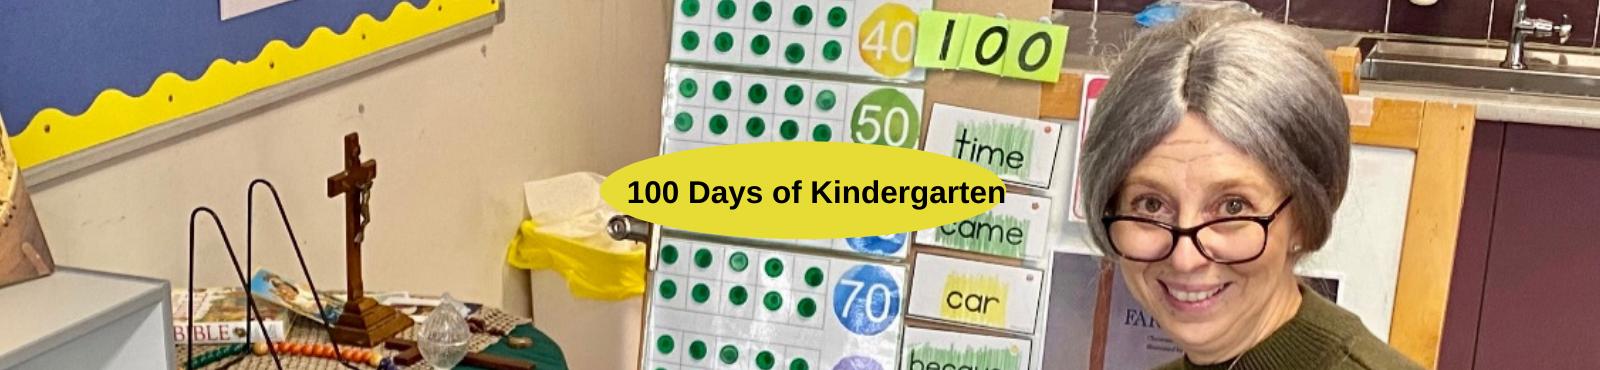 Kindergarten celebrating 100 days of school – July 2021